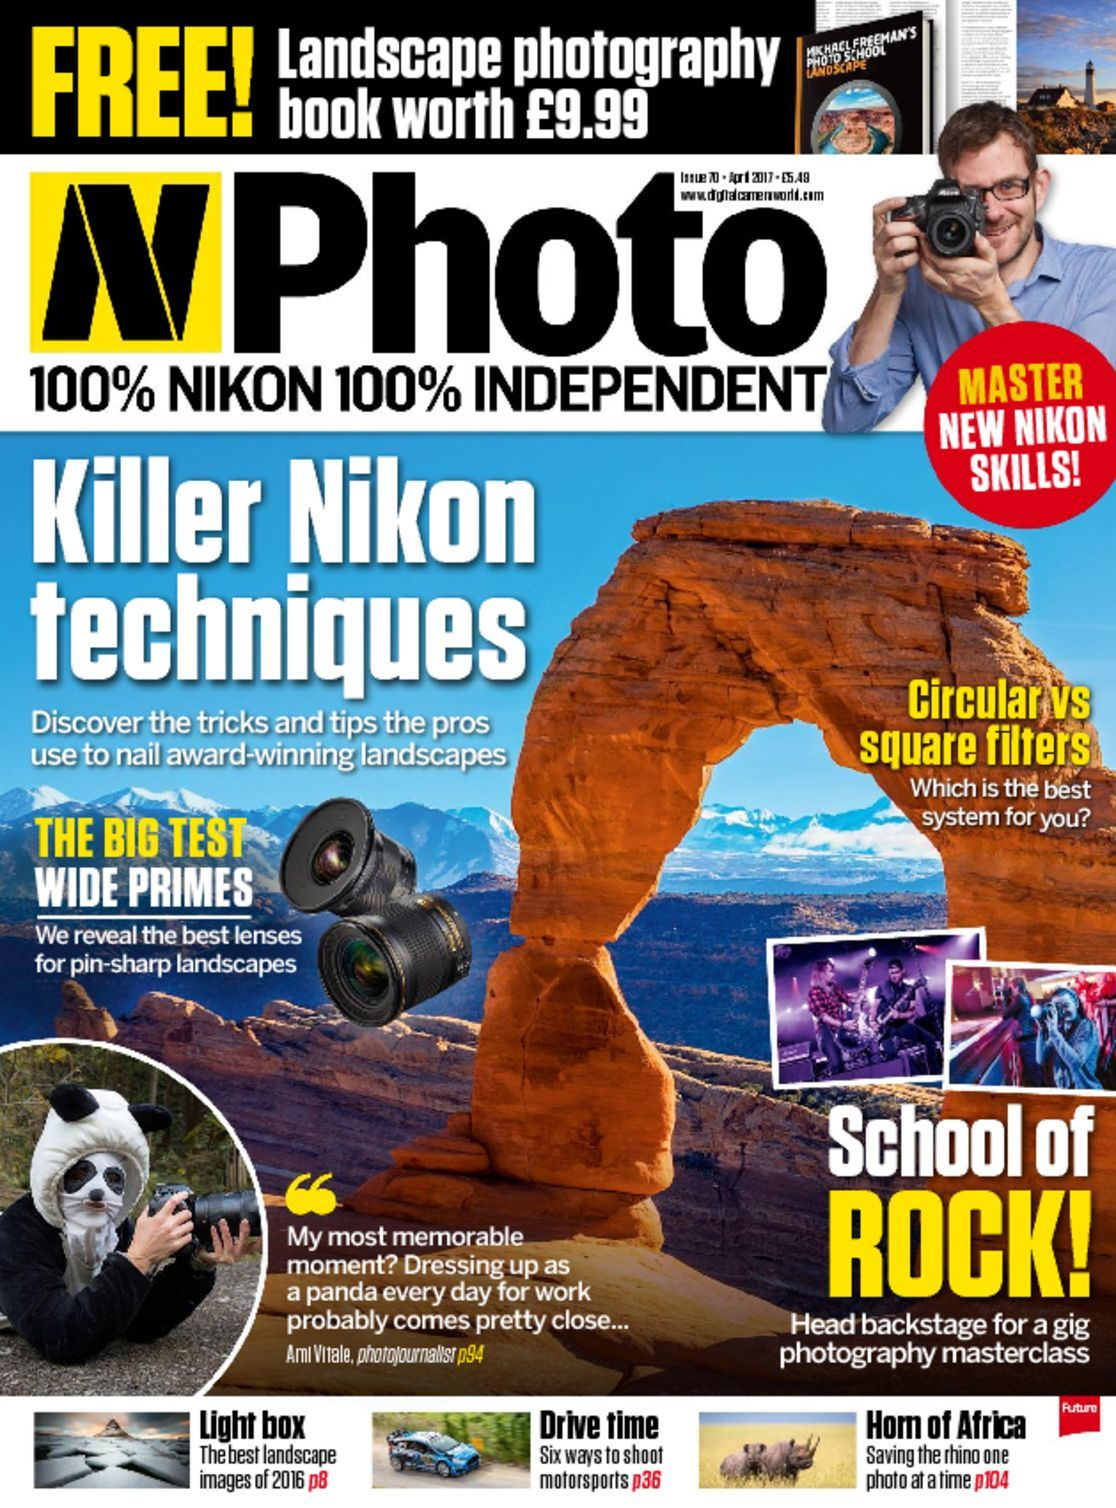 N-photo: The Nikon (Digital)